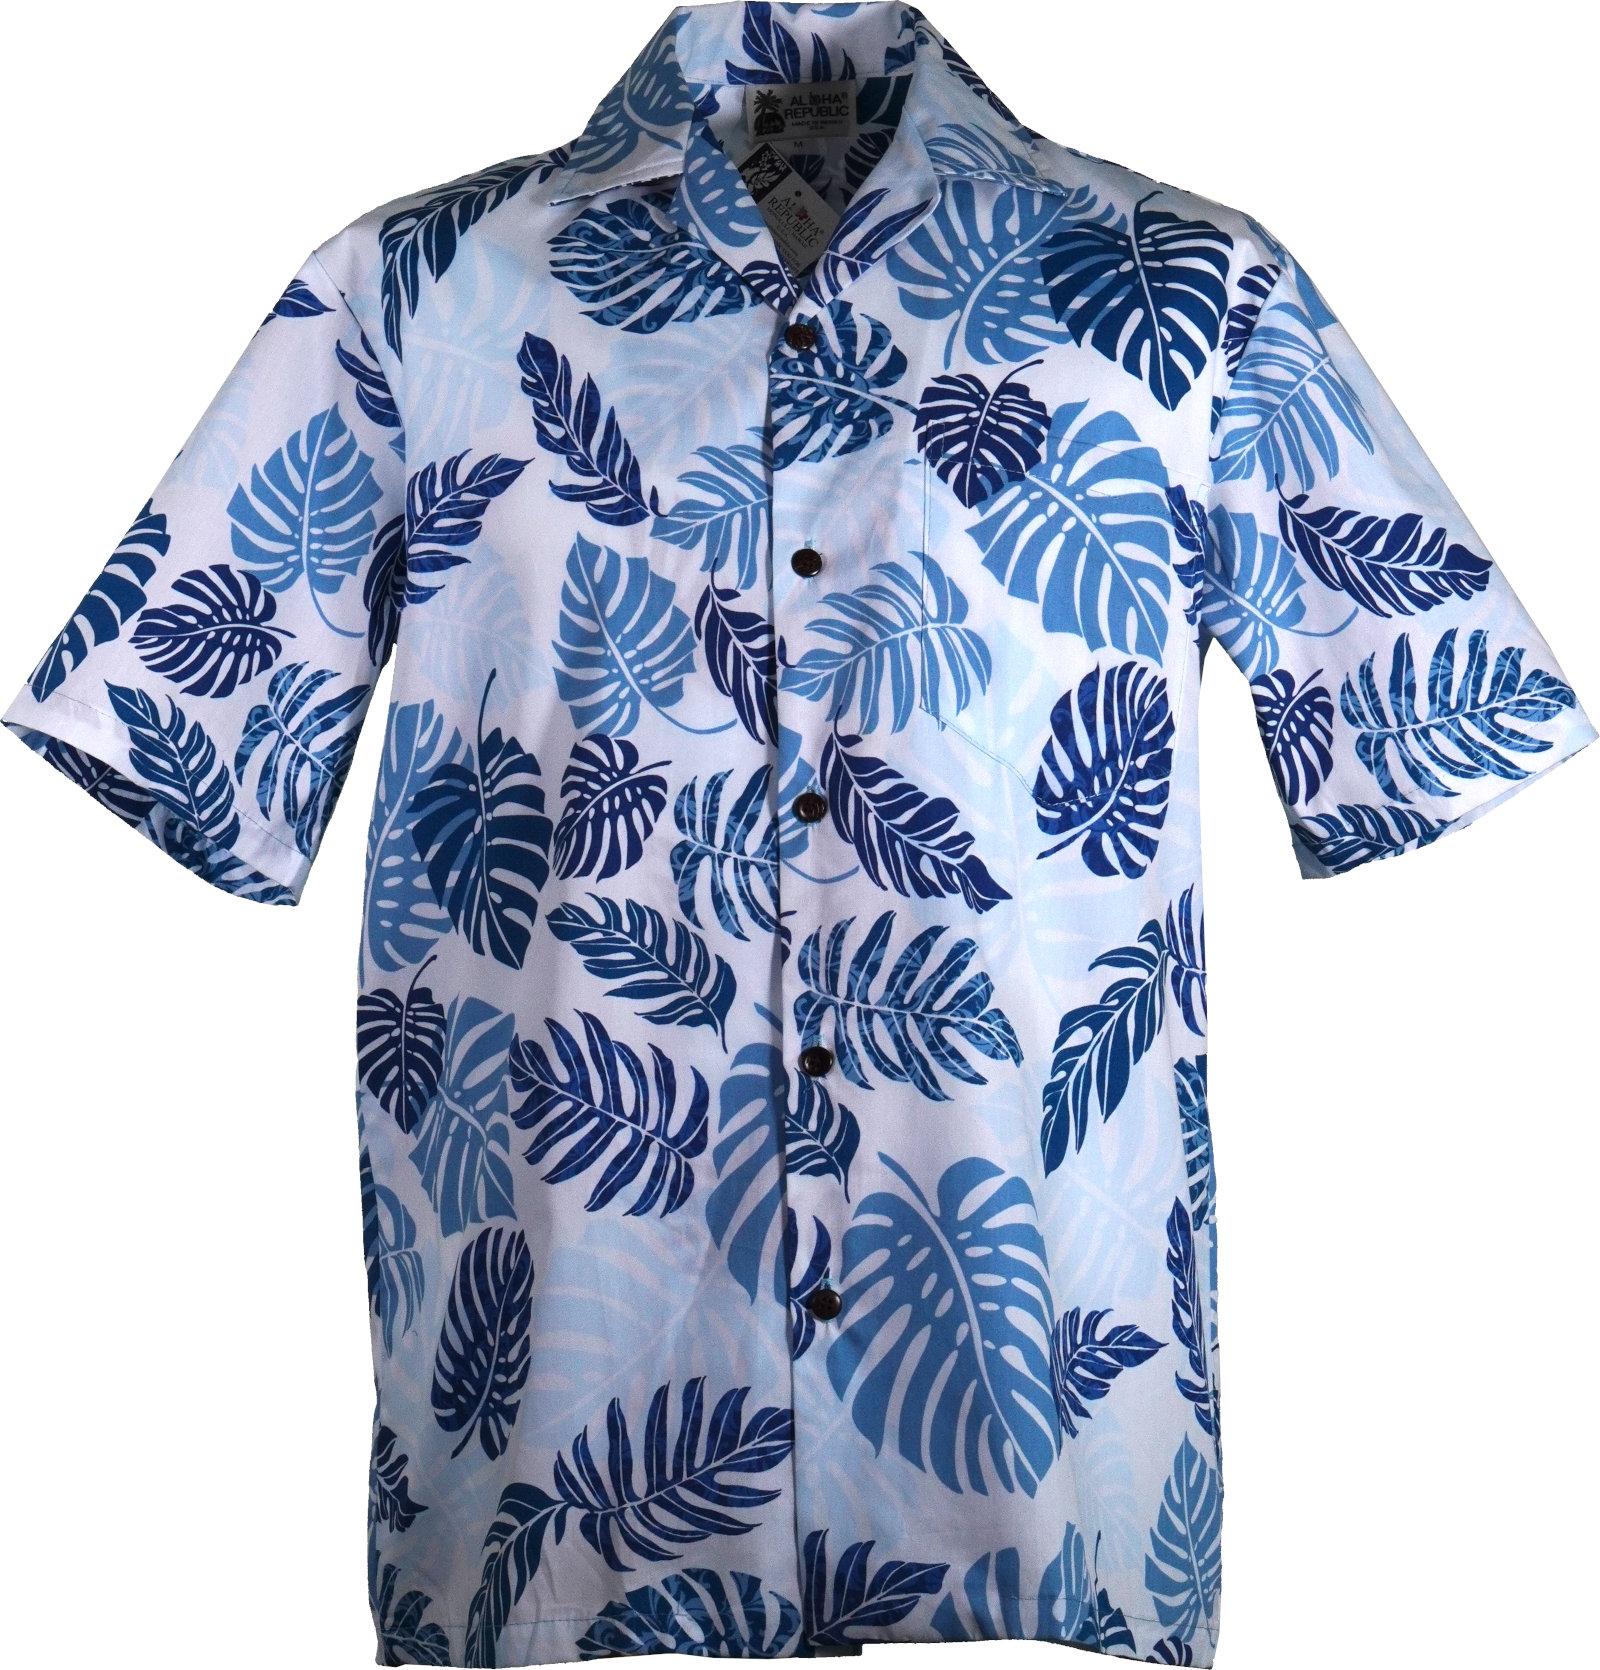 Original Hawaiihemd -Mac B-